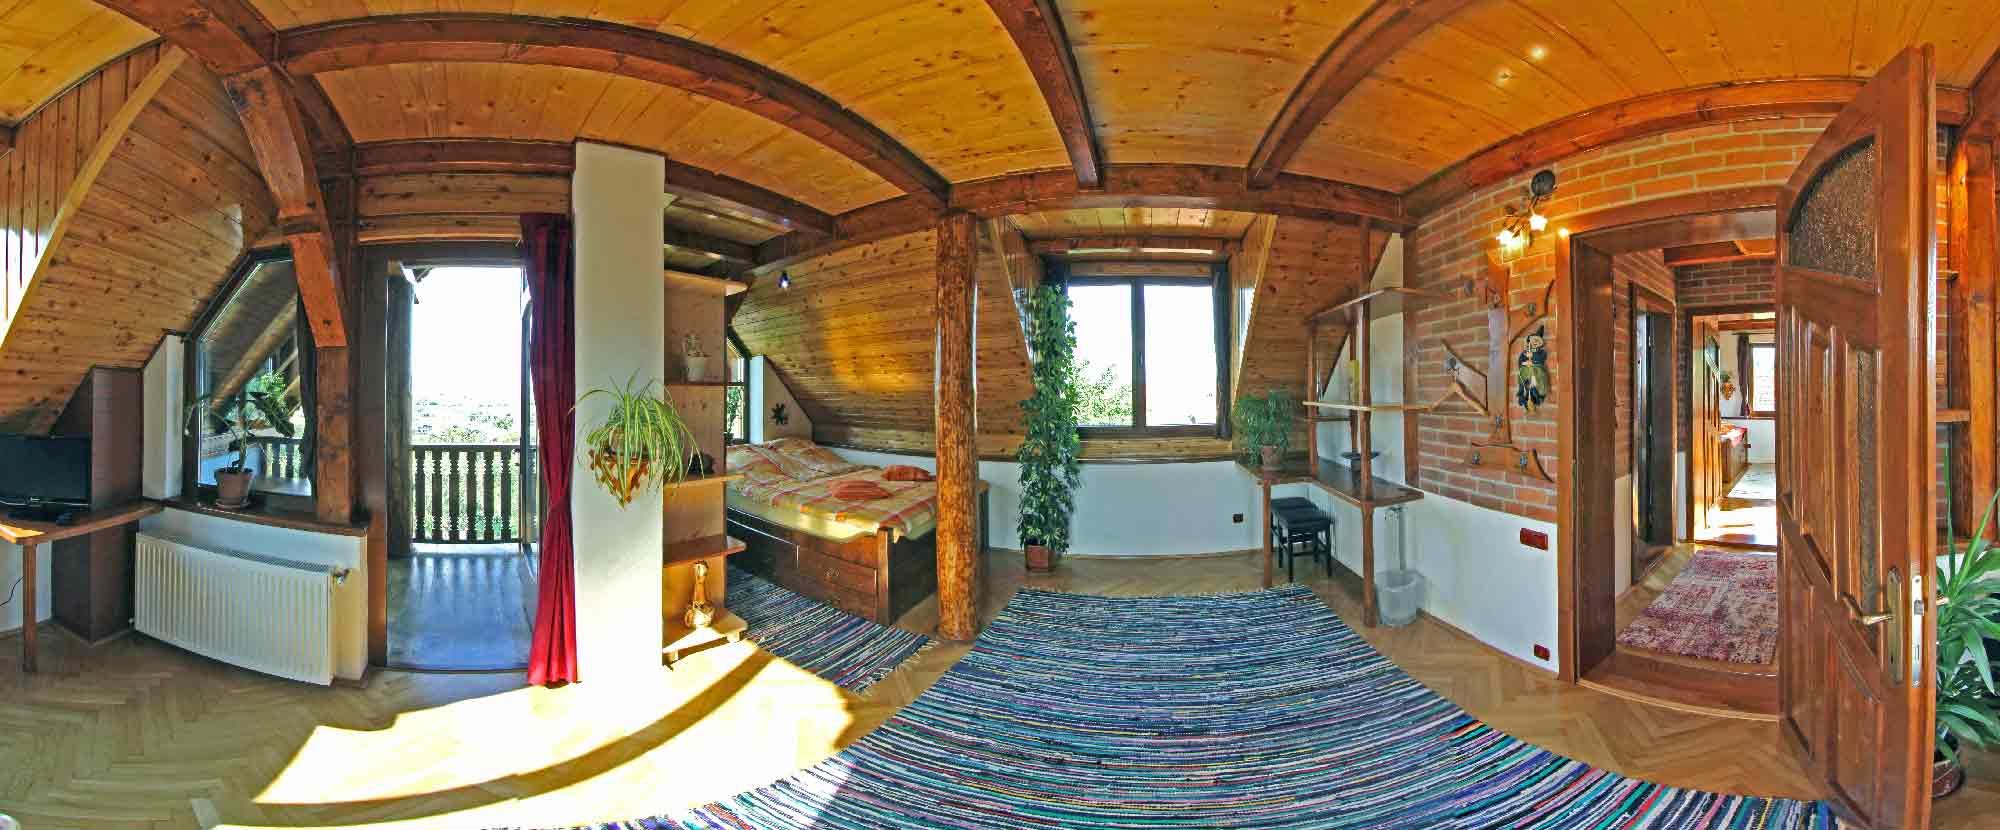 transylvania holiday home romania | carpathian homes, villa rentals & apartments for transylvania holidays in romania